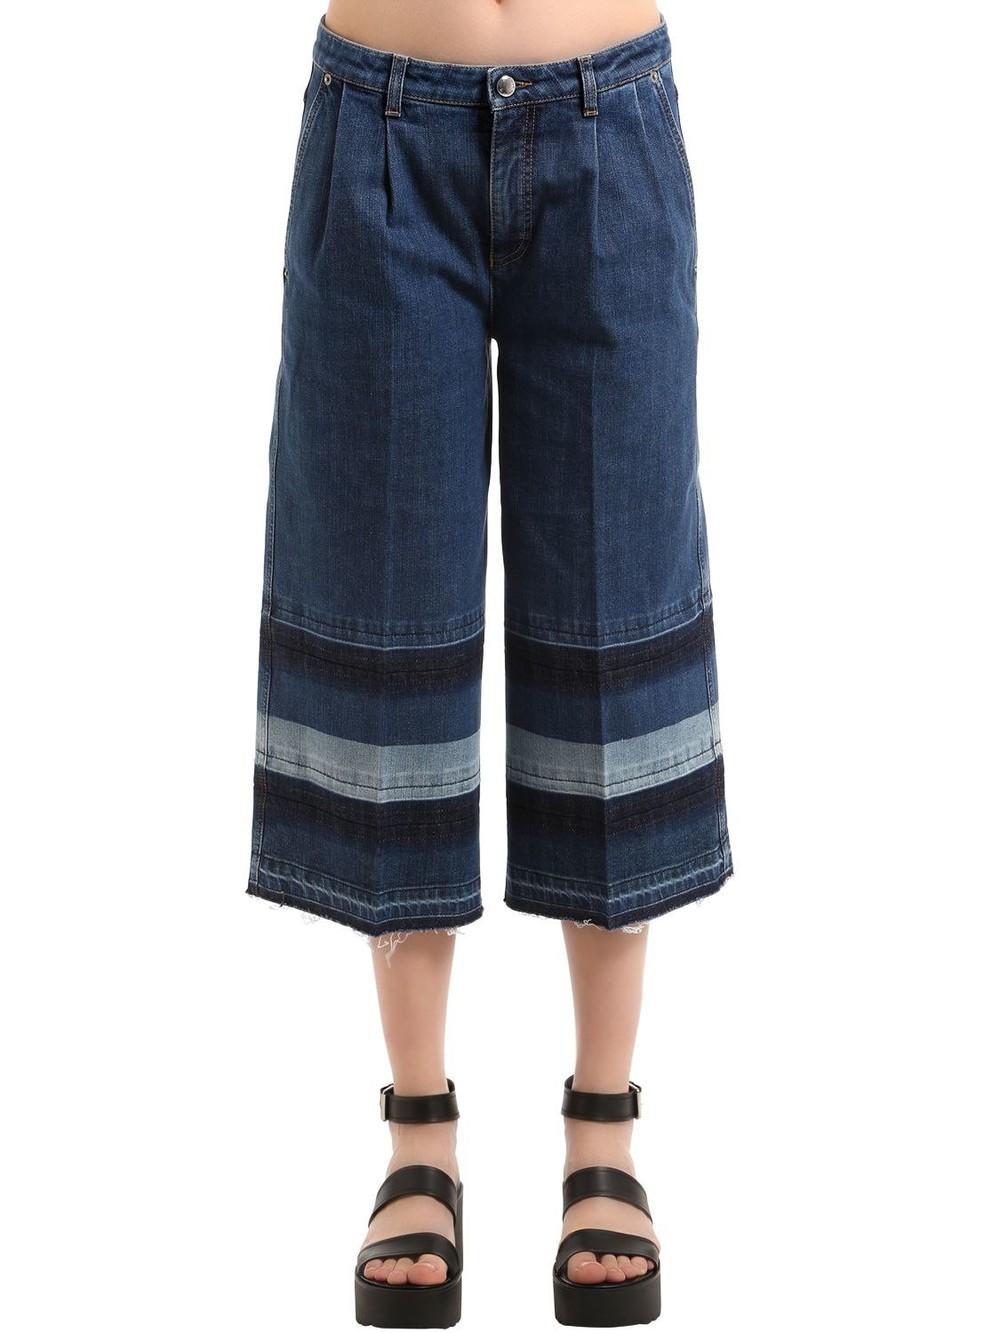 SONIA RYKIEL Denim Jeans With Striped Released Hem in blue